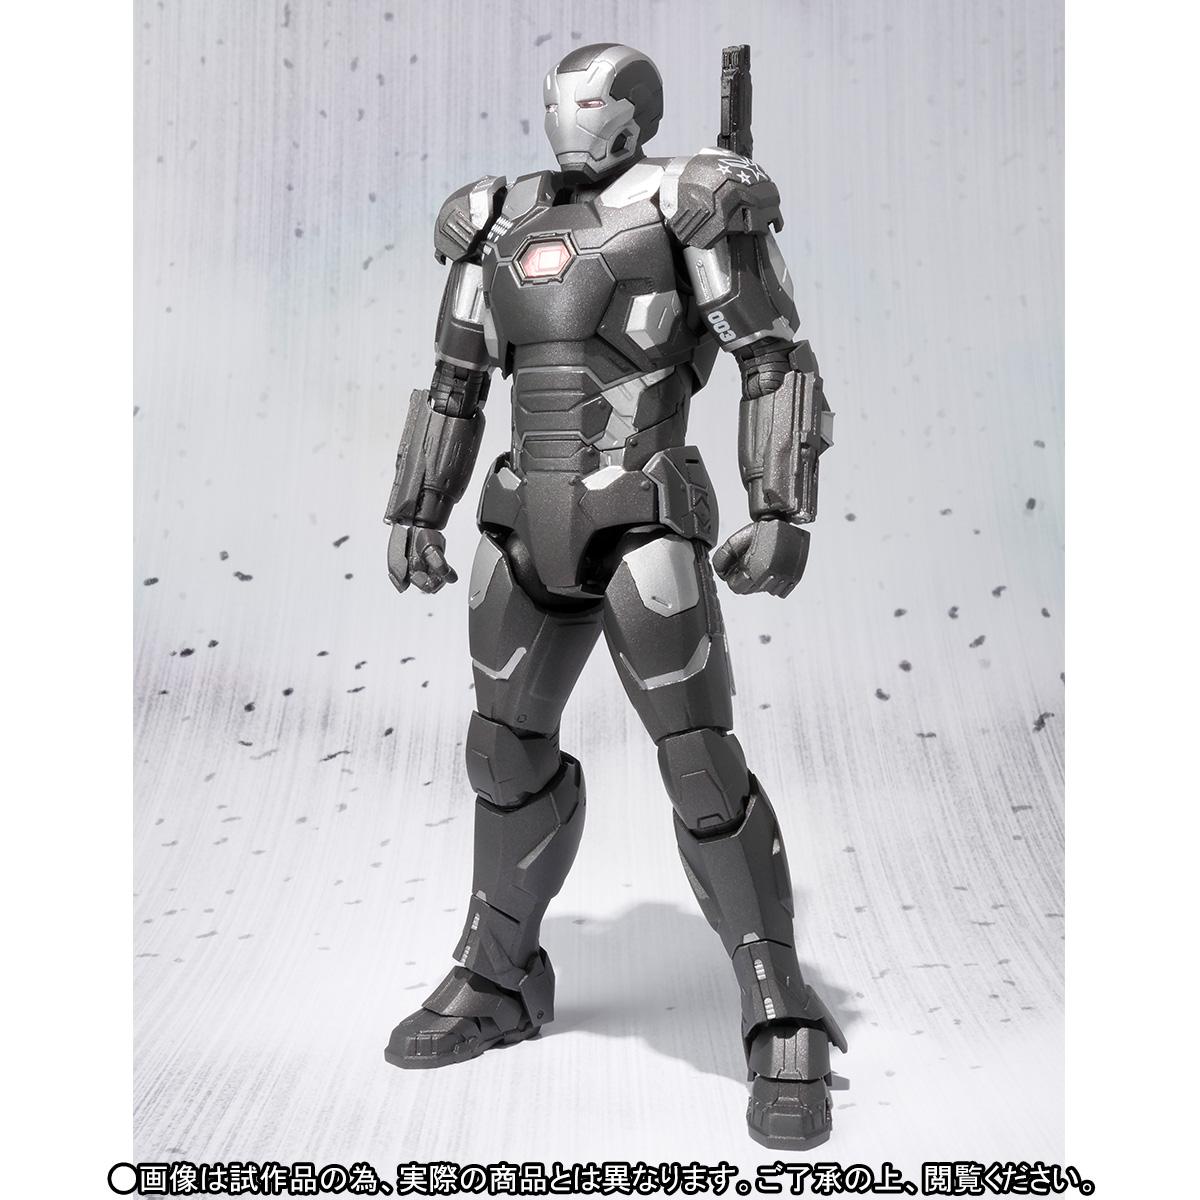 [Comentários] Marvel S.H.Figuarts - Página 2 YVdNtiAr